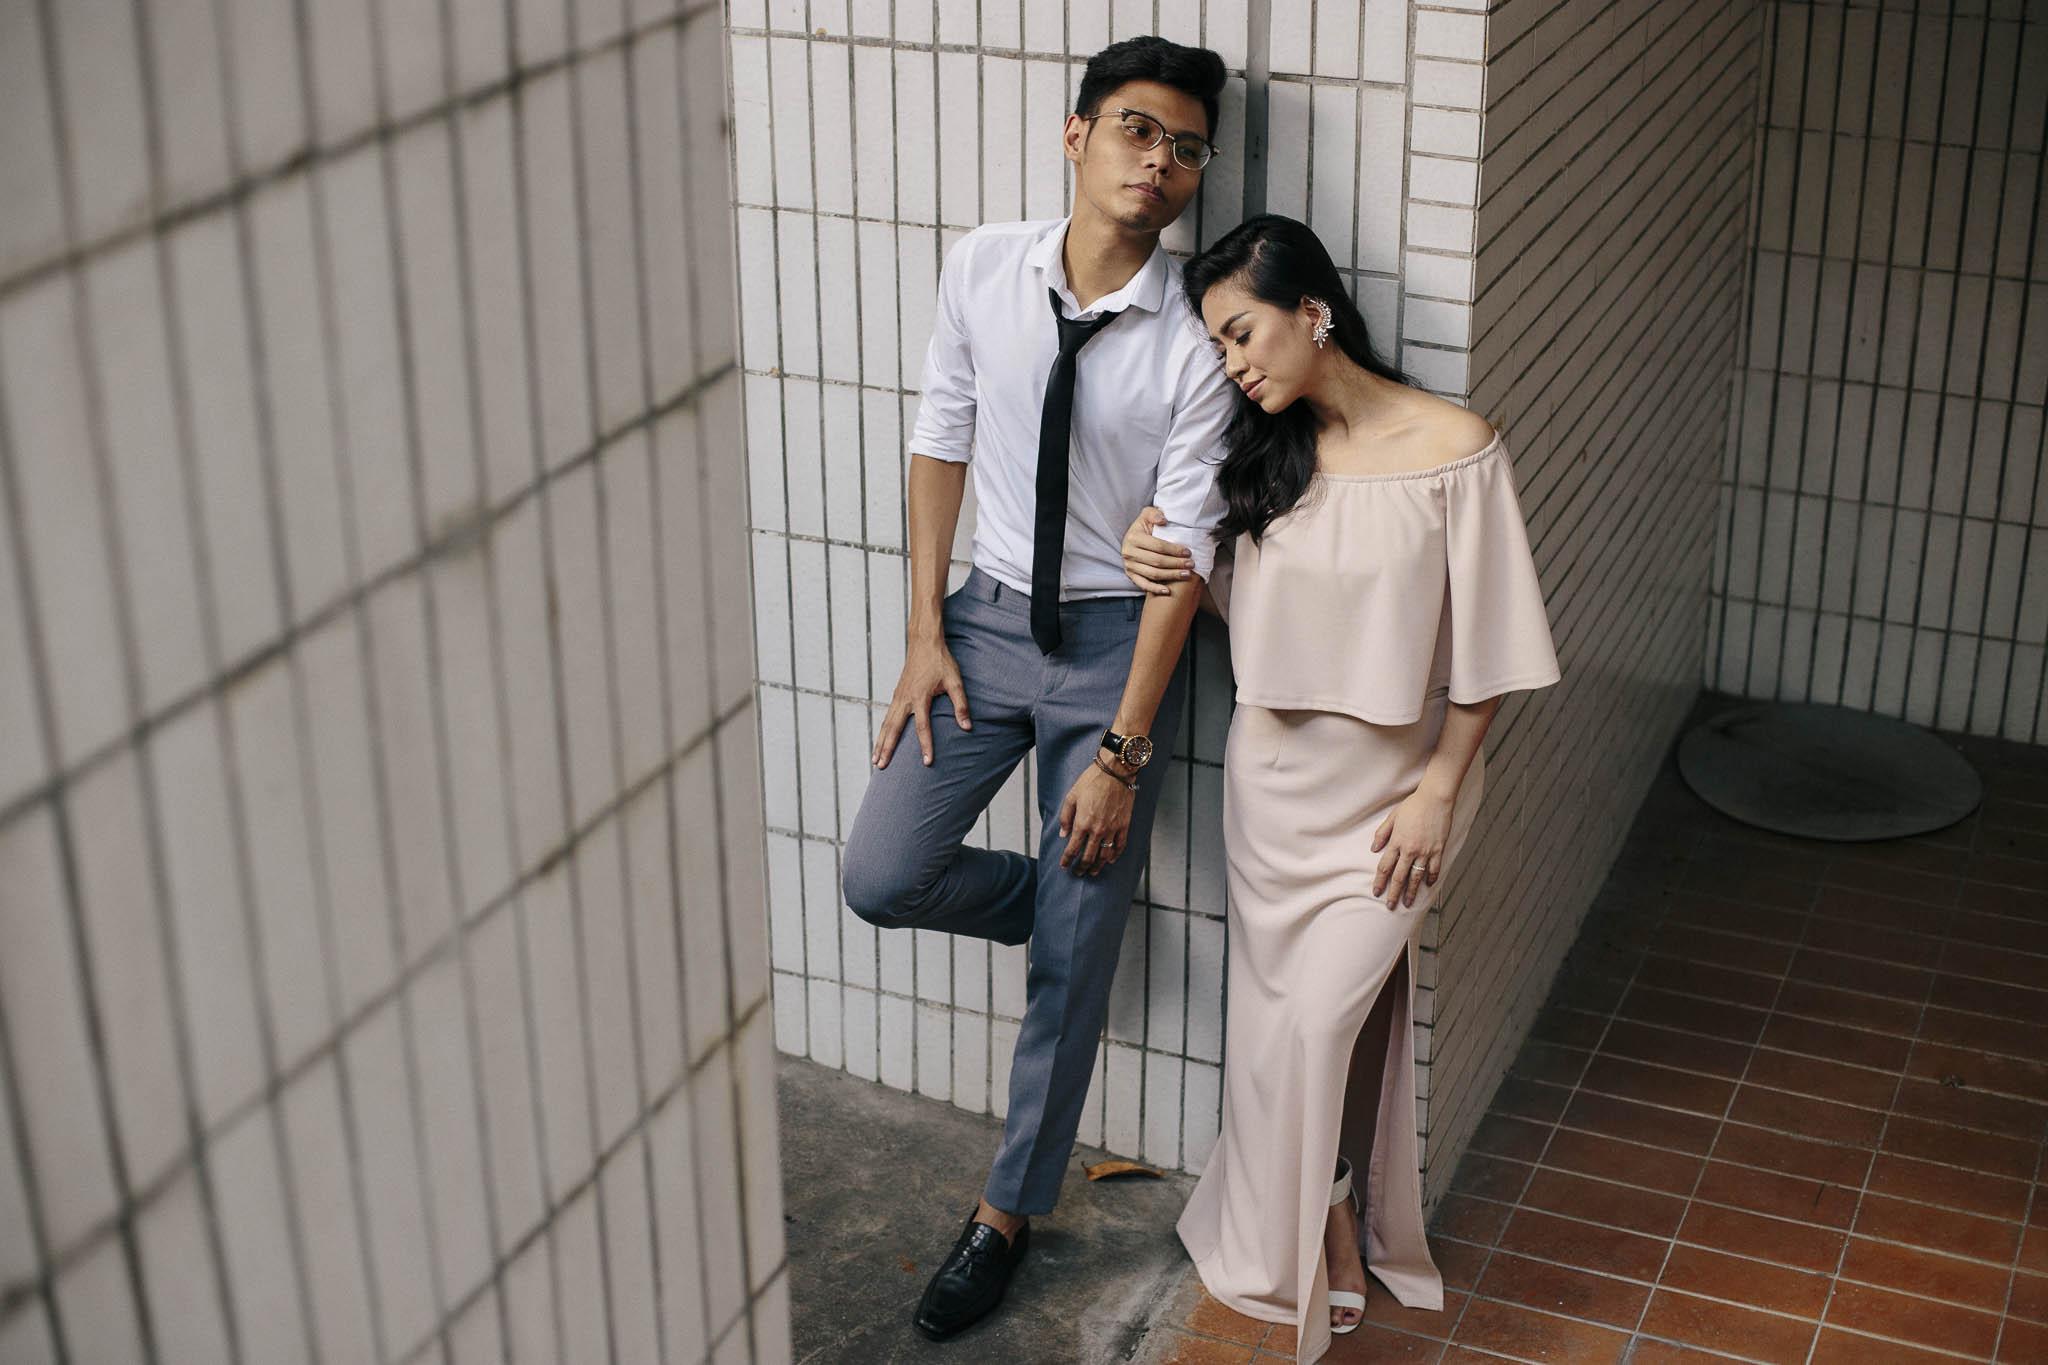 singapore-wedding-photographer-malay-travel-adli-tashah-16.jpg